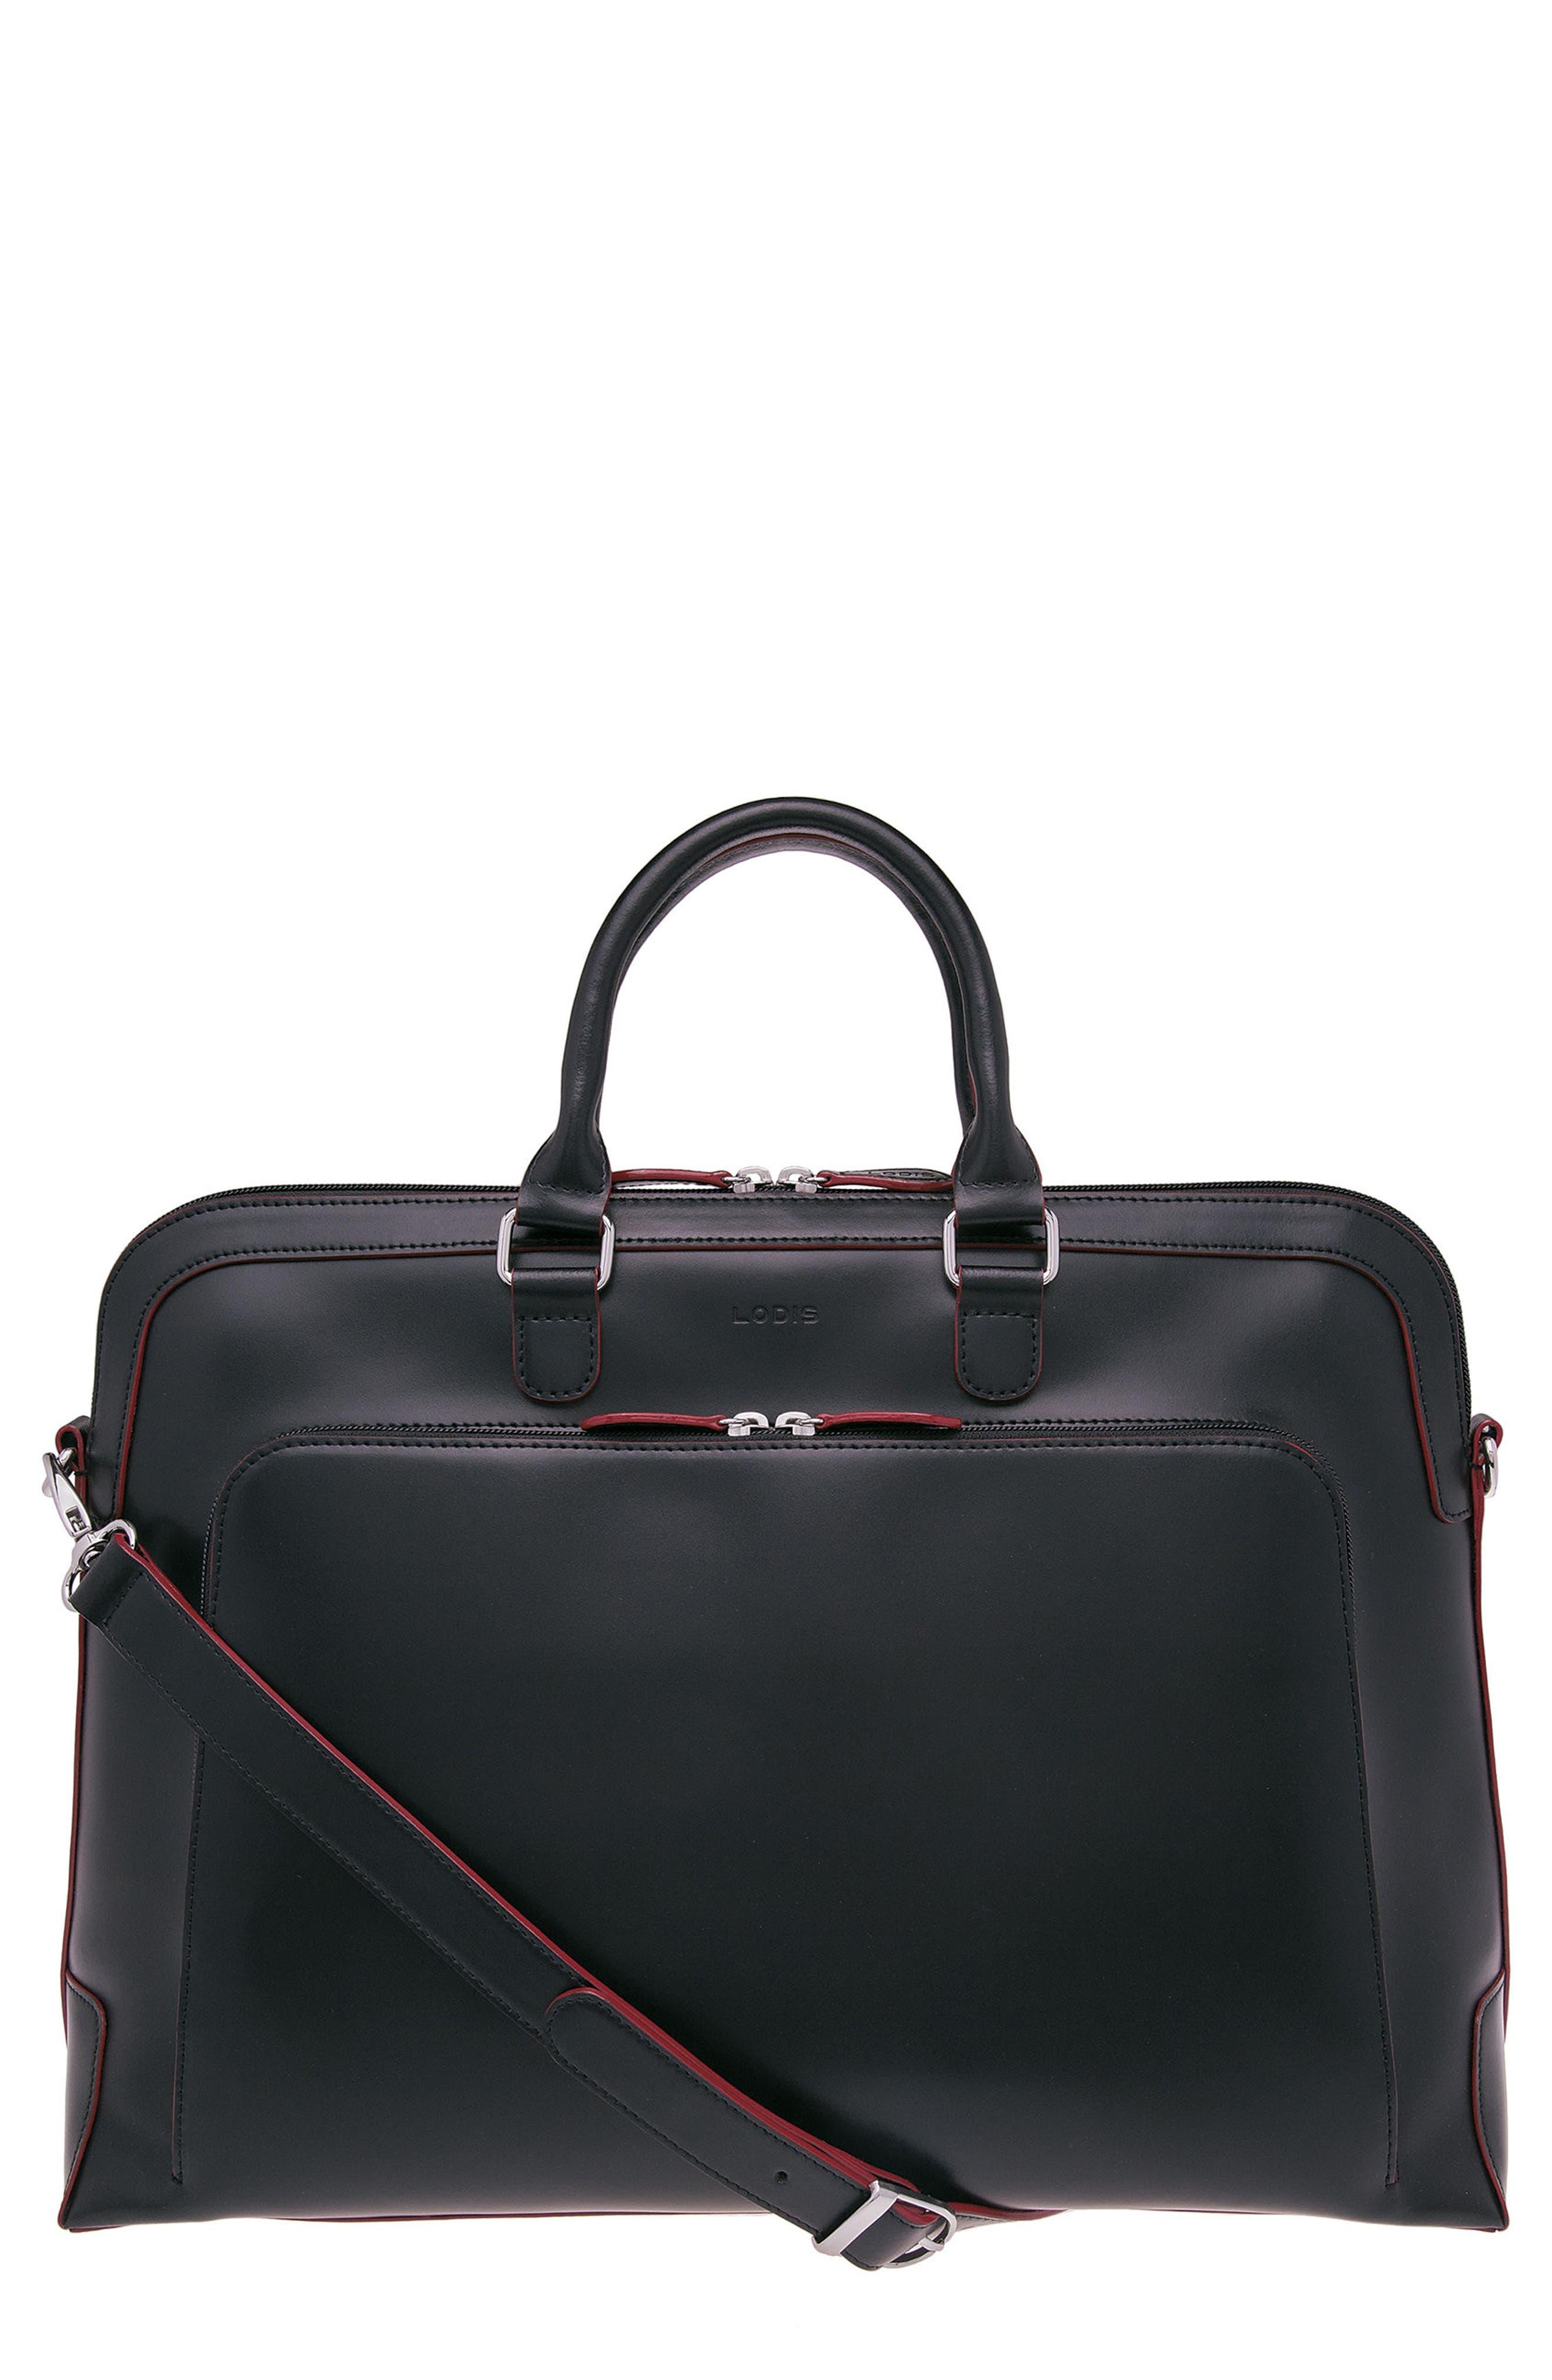 Lodis 'Audrey Brera' Leather Briefcase,                         Main,                         color, 001